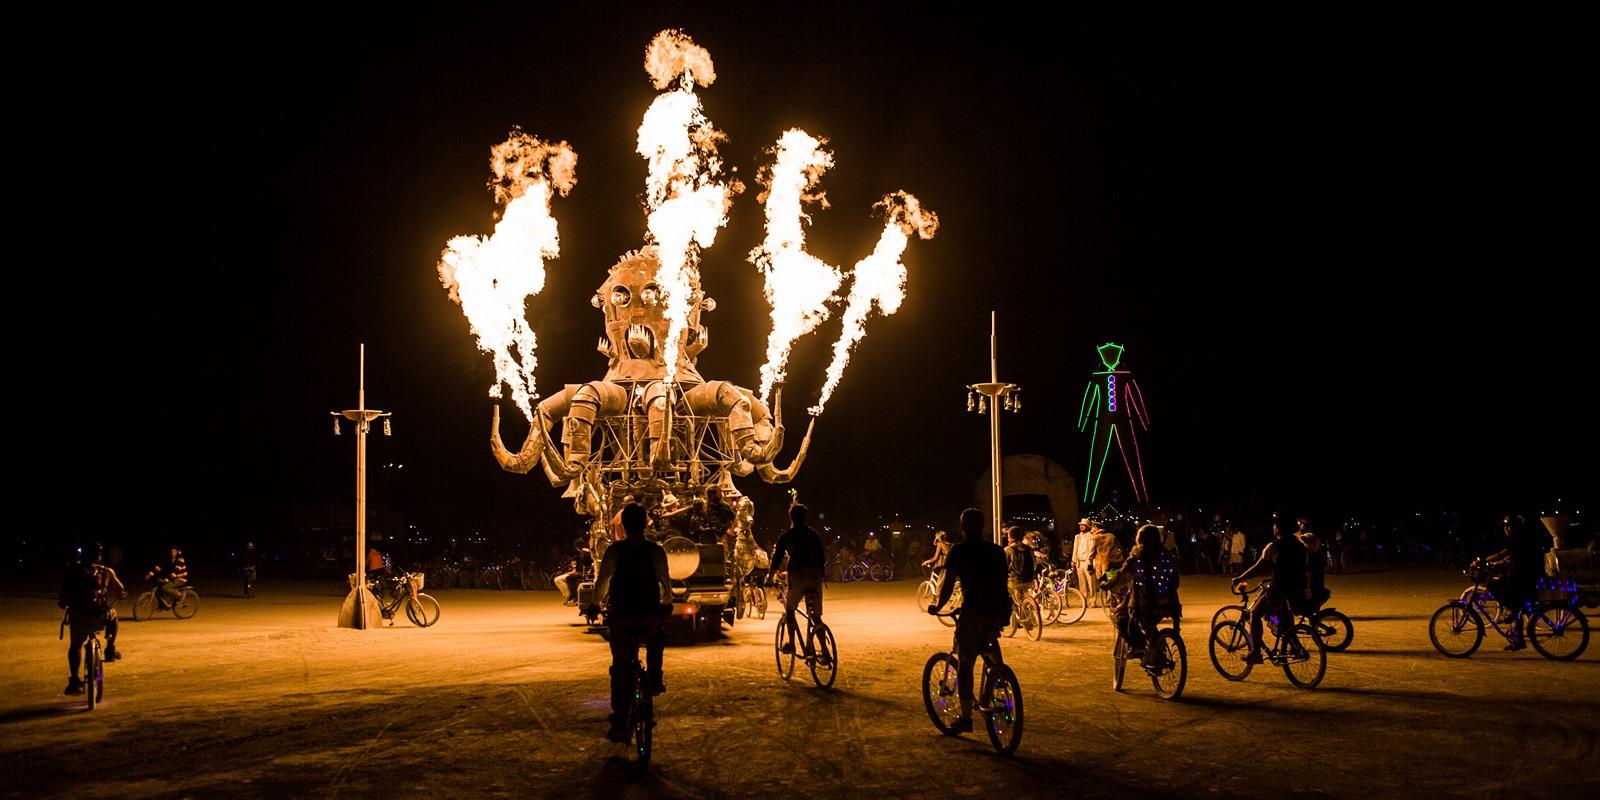 Burning Man - El pulpo mecanico